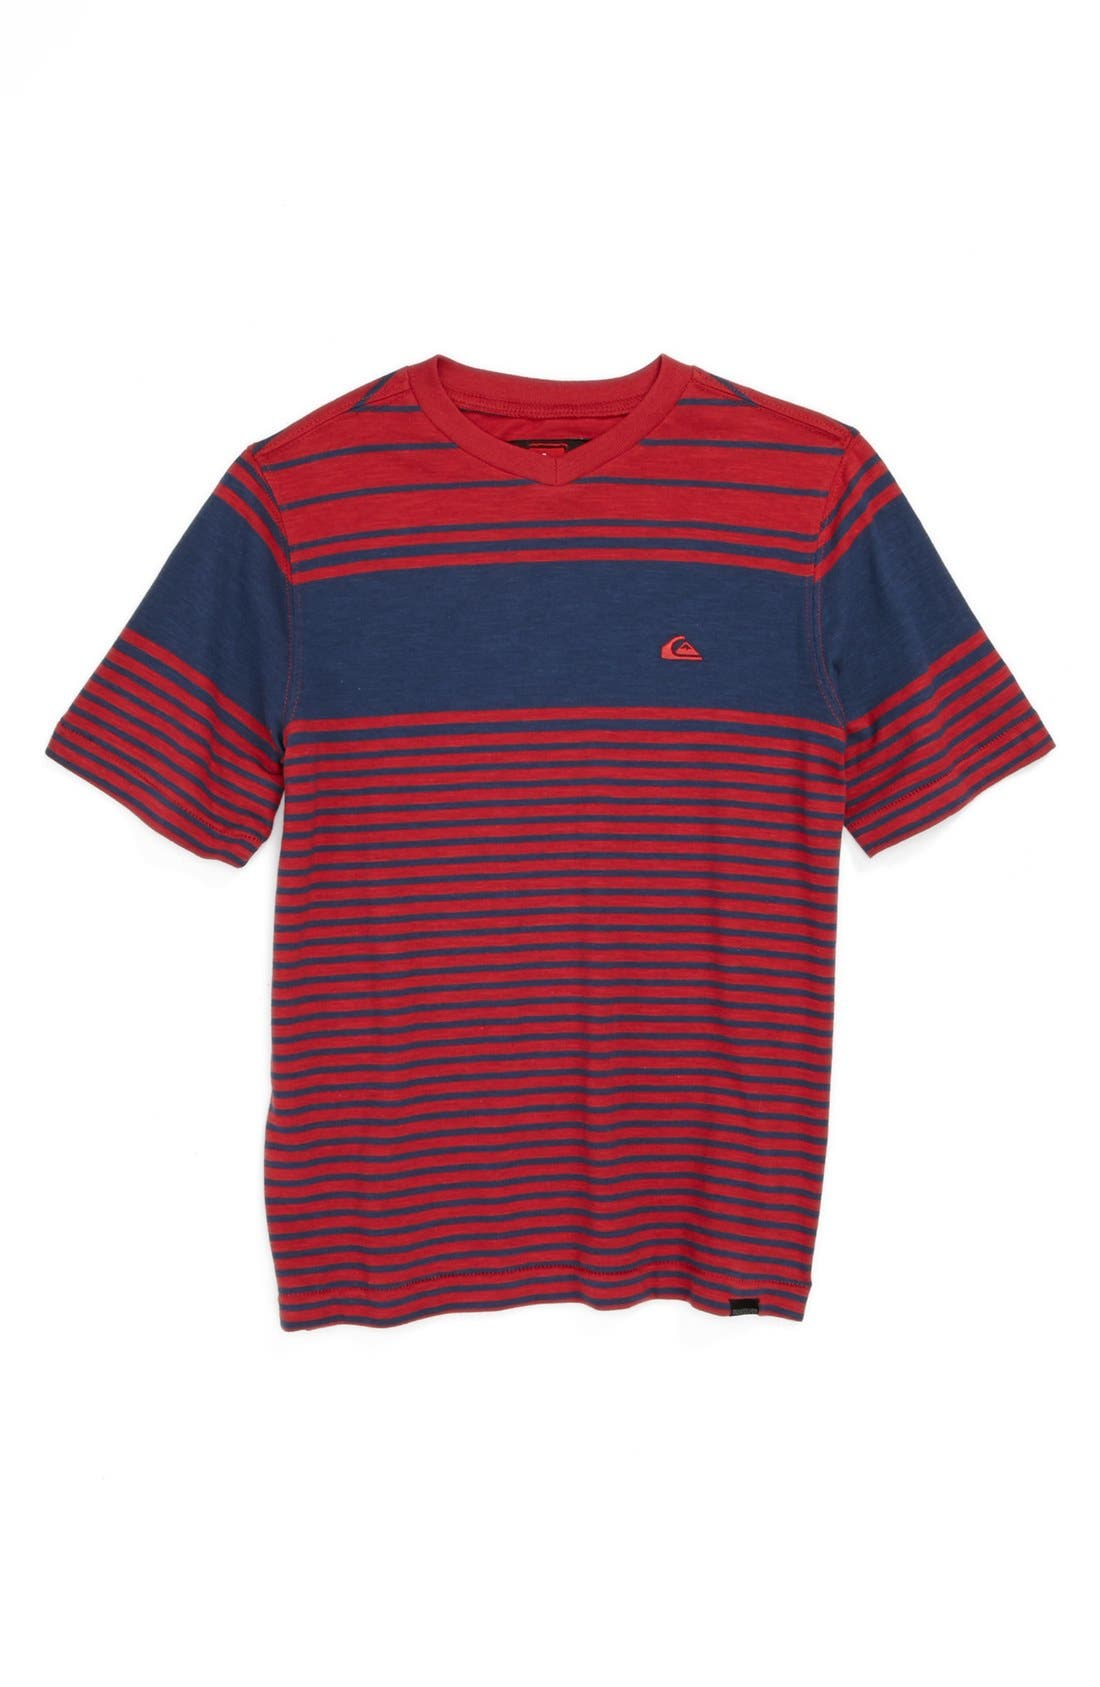 Main Image - Quiksilver 'Vert Shoe By' T-Shirt (Little Boys & Big Boys)